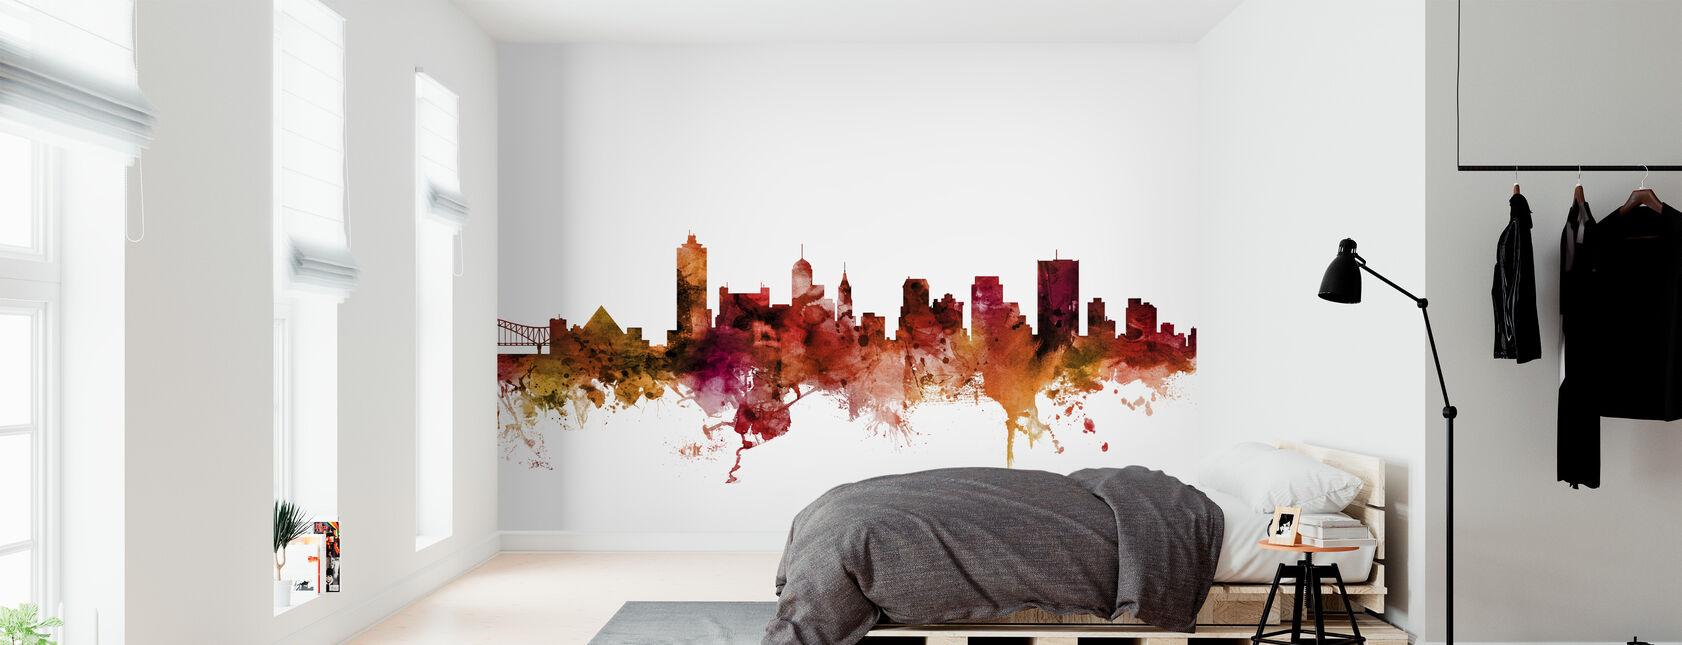 Memphis Tennessee Skyline - Wallpaper - Bedroom